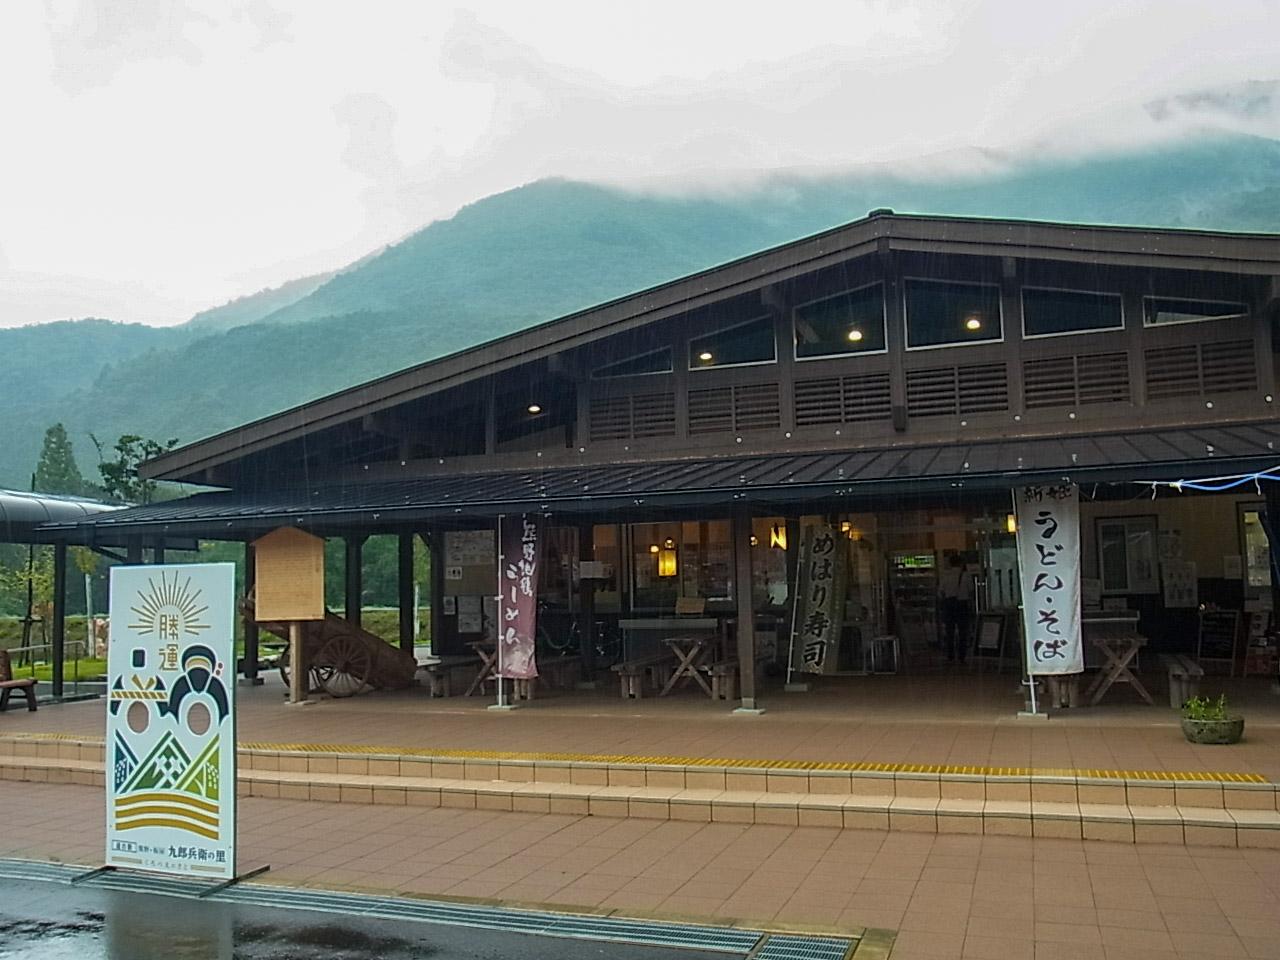 道の駅 熊野・板屋 九郎兵衛の里